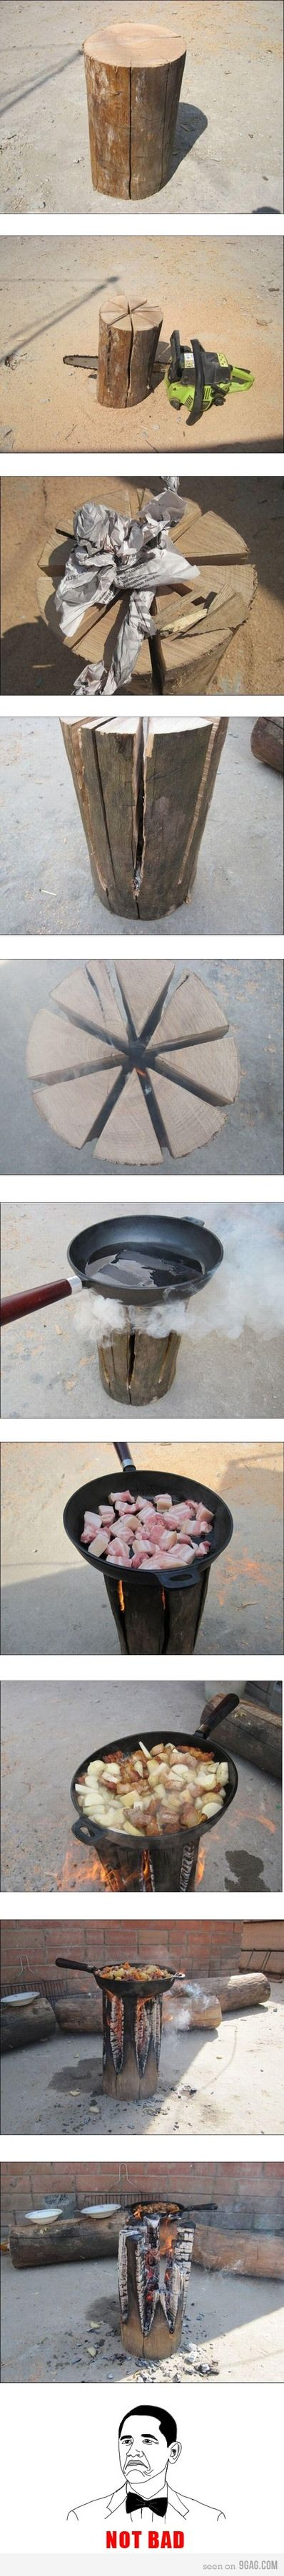 Build a stove.